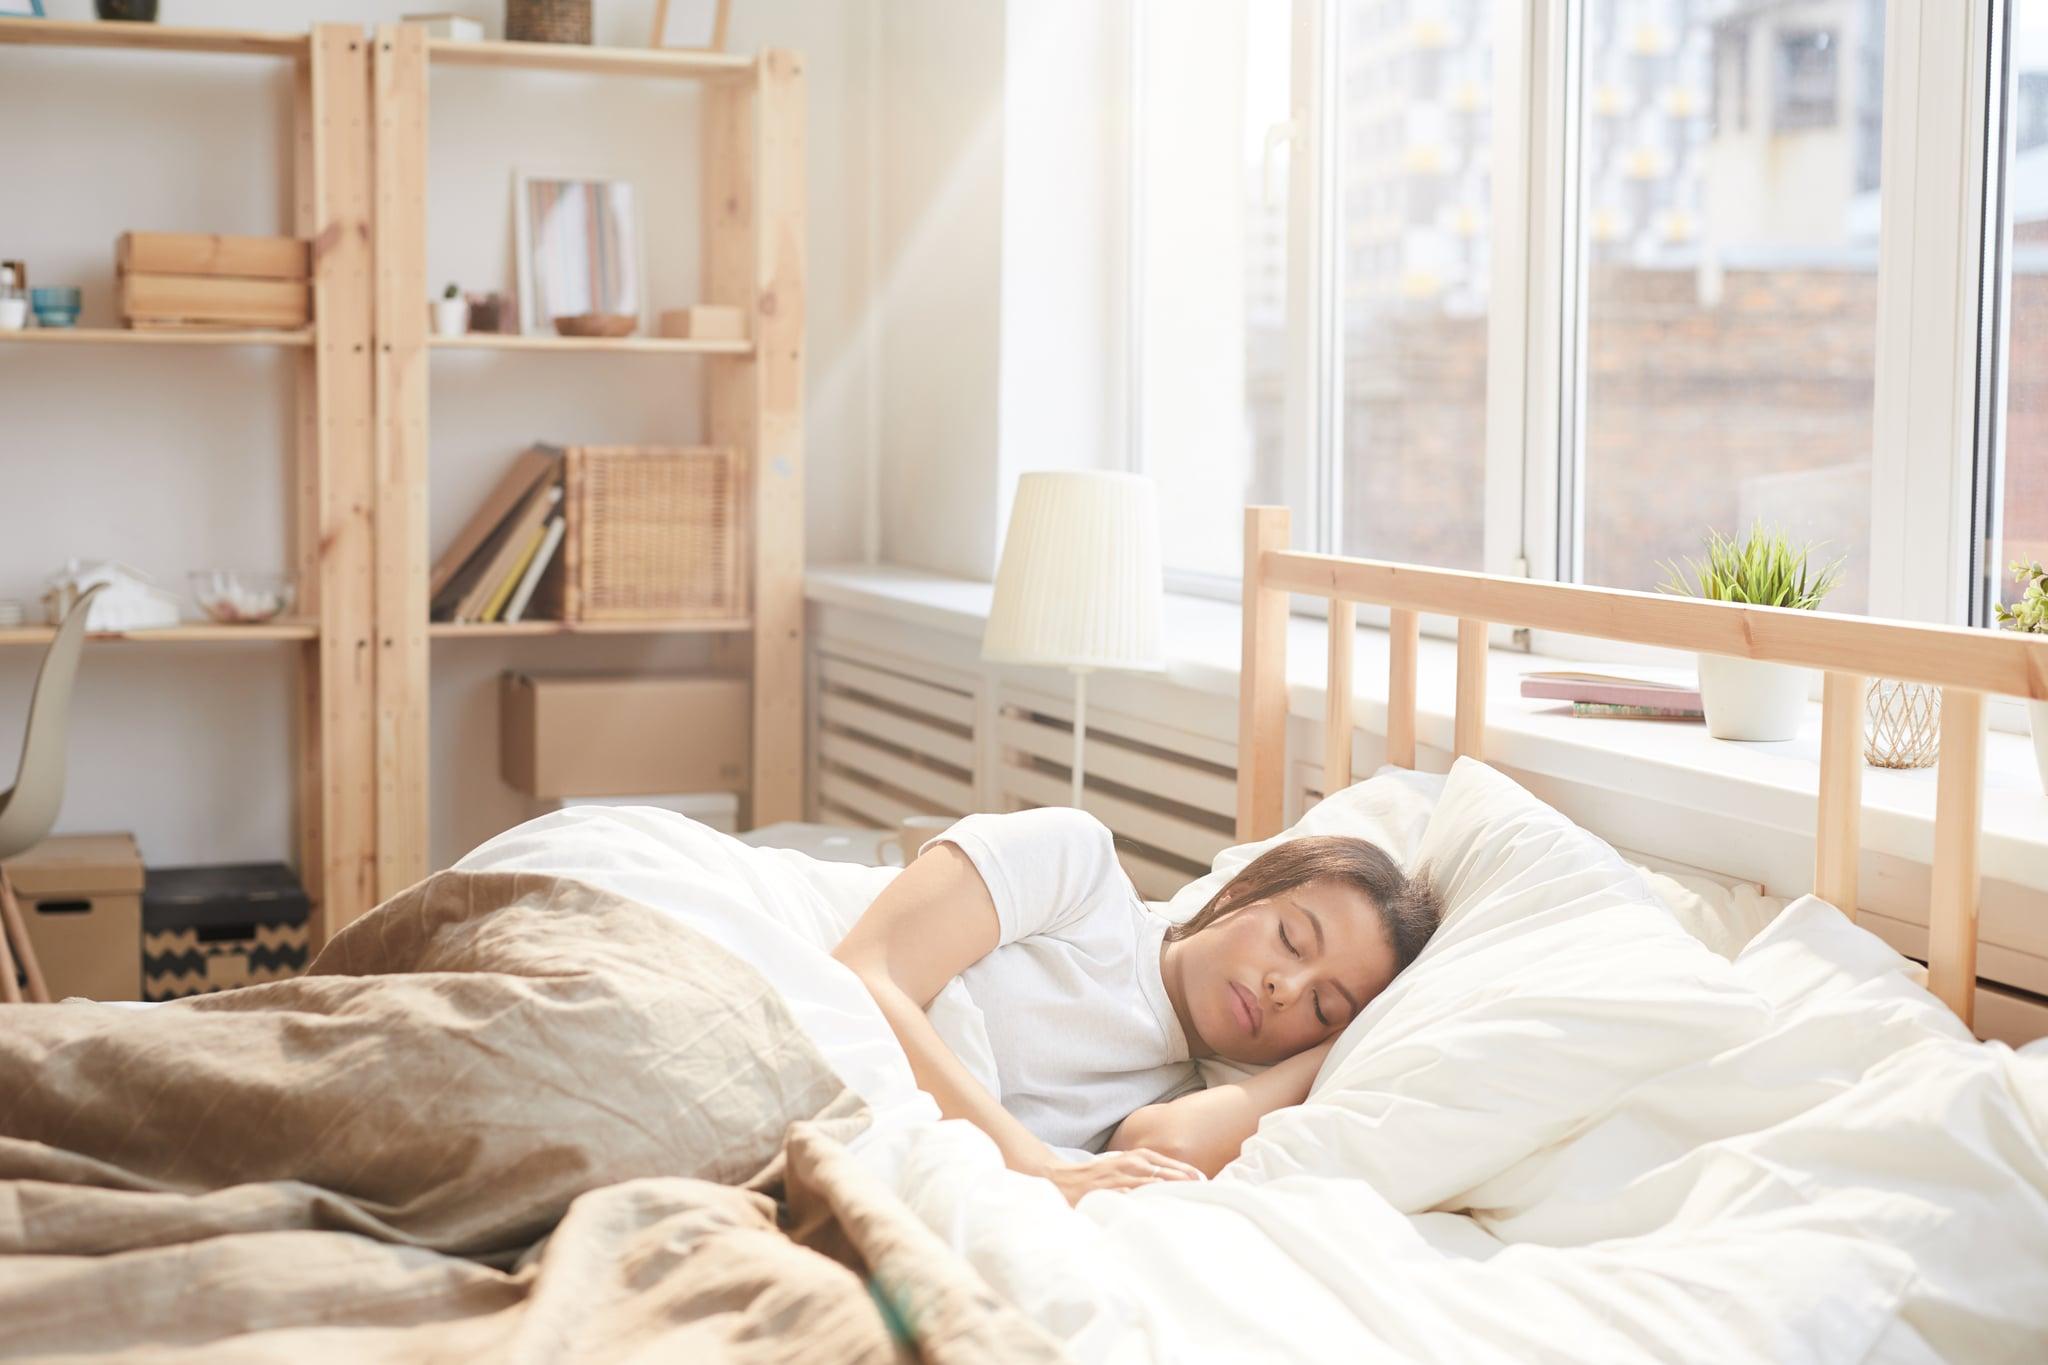 Portrait of beautiful Mixed-Race woman sleeping in bed in sunlit bedroom, copy space